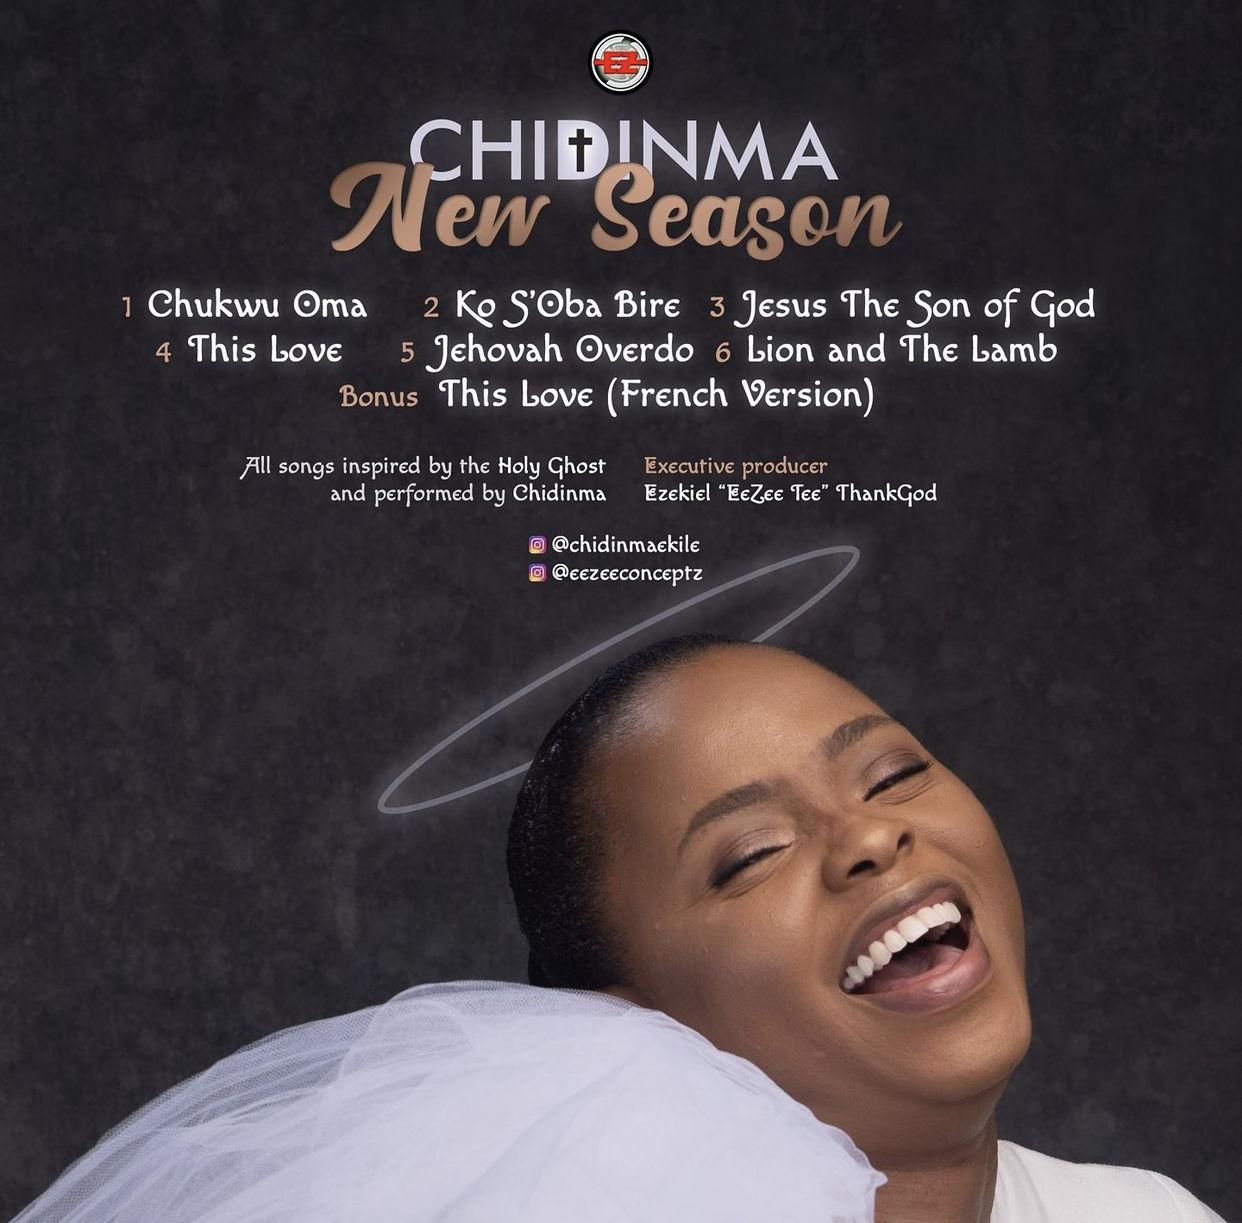 Chidinma New Season tracklist